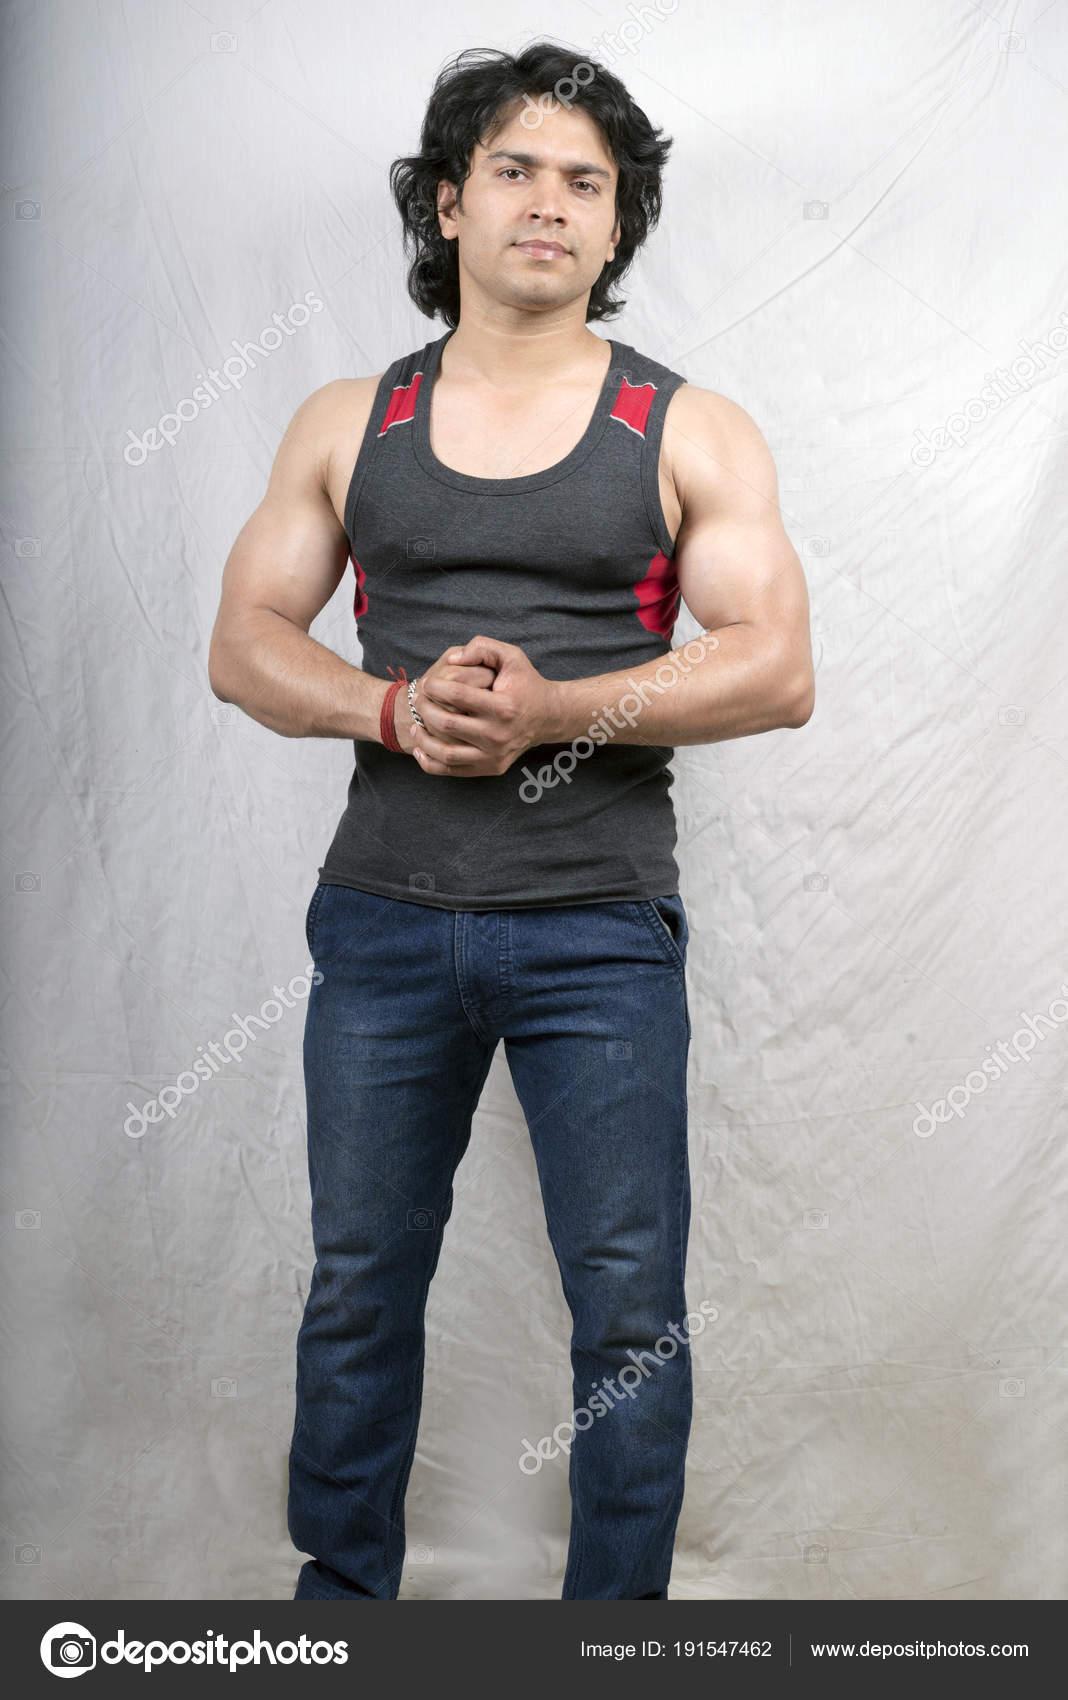 Images Indian Models Male Indian Male Model In Grey Vest Stock Photo C Rioillustrator 191547462